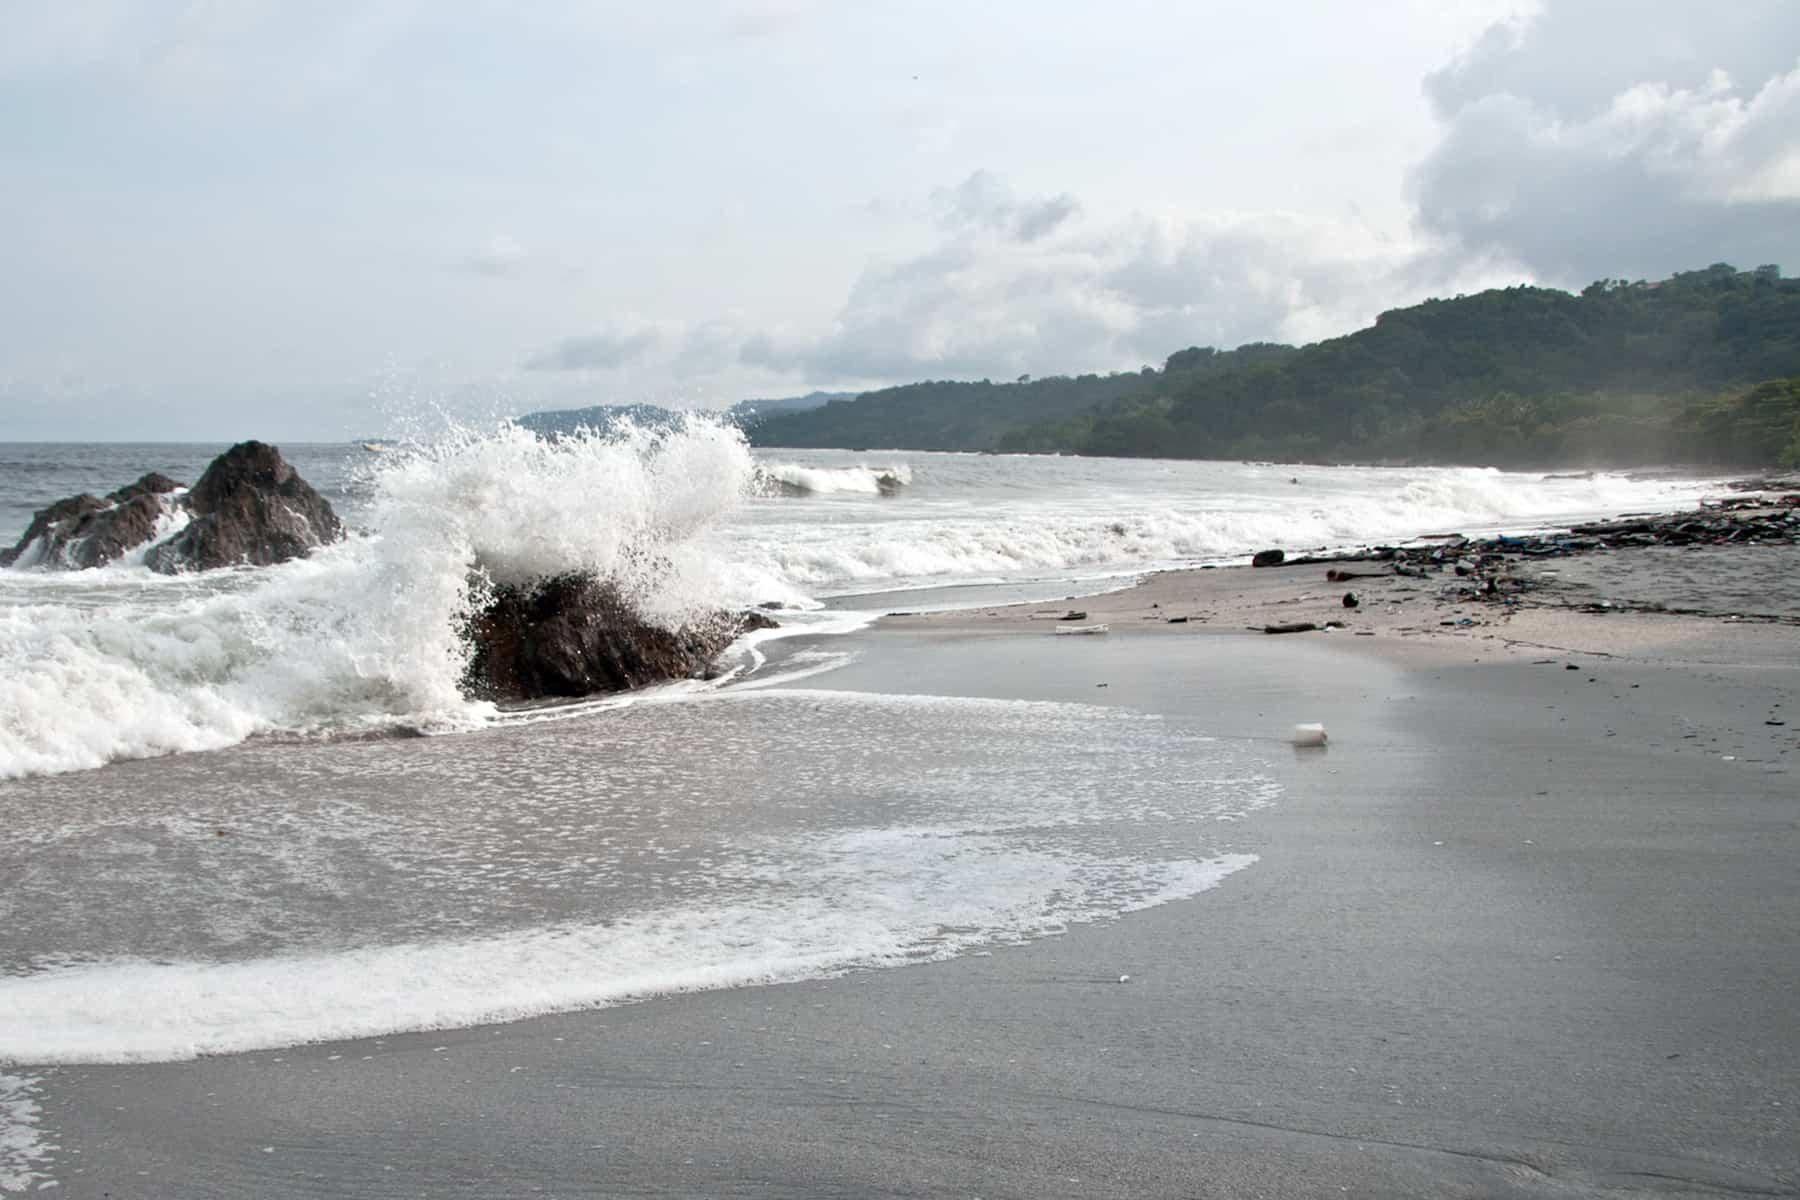 Costa Rica weather: Montezuma beach, Puntarenas